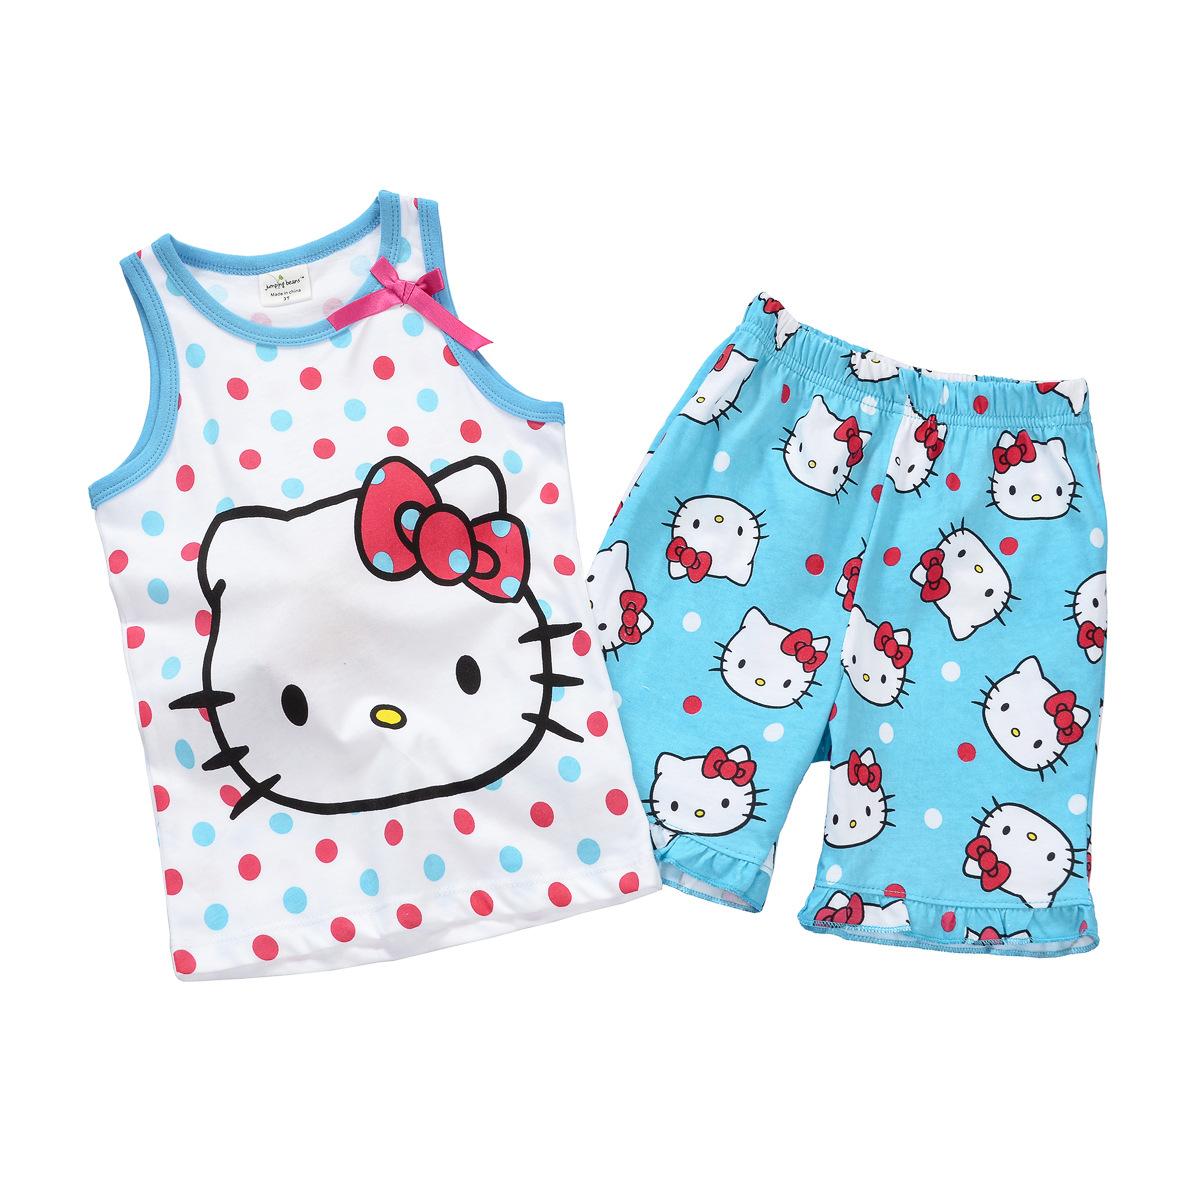 New 2014 Baby & Kids Hello Kitty Clothing Set Girl Suit 2Pcs sleeveless T-Shirt+Pants Girls Summer Sets Clearance(China (Mainland))